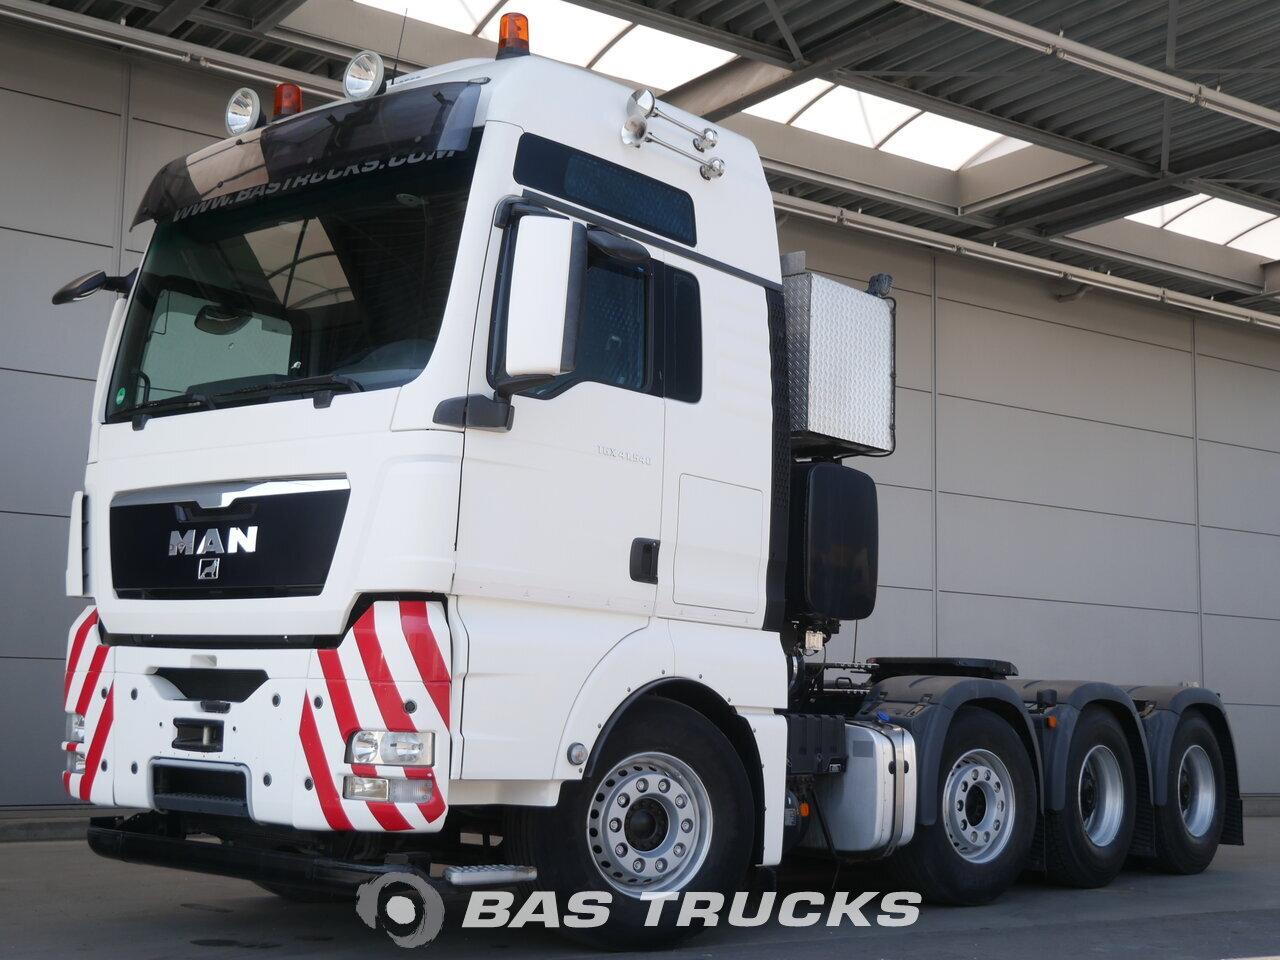 man tgx xxl trekker euro norm 5 57200 bas trucks. Black Bedroom Furniture Sets. Home Design Ideas